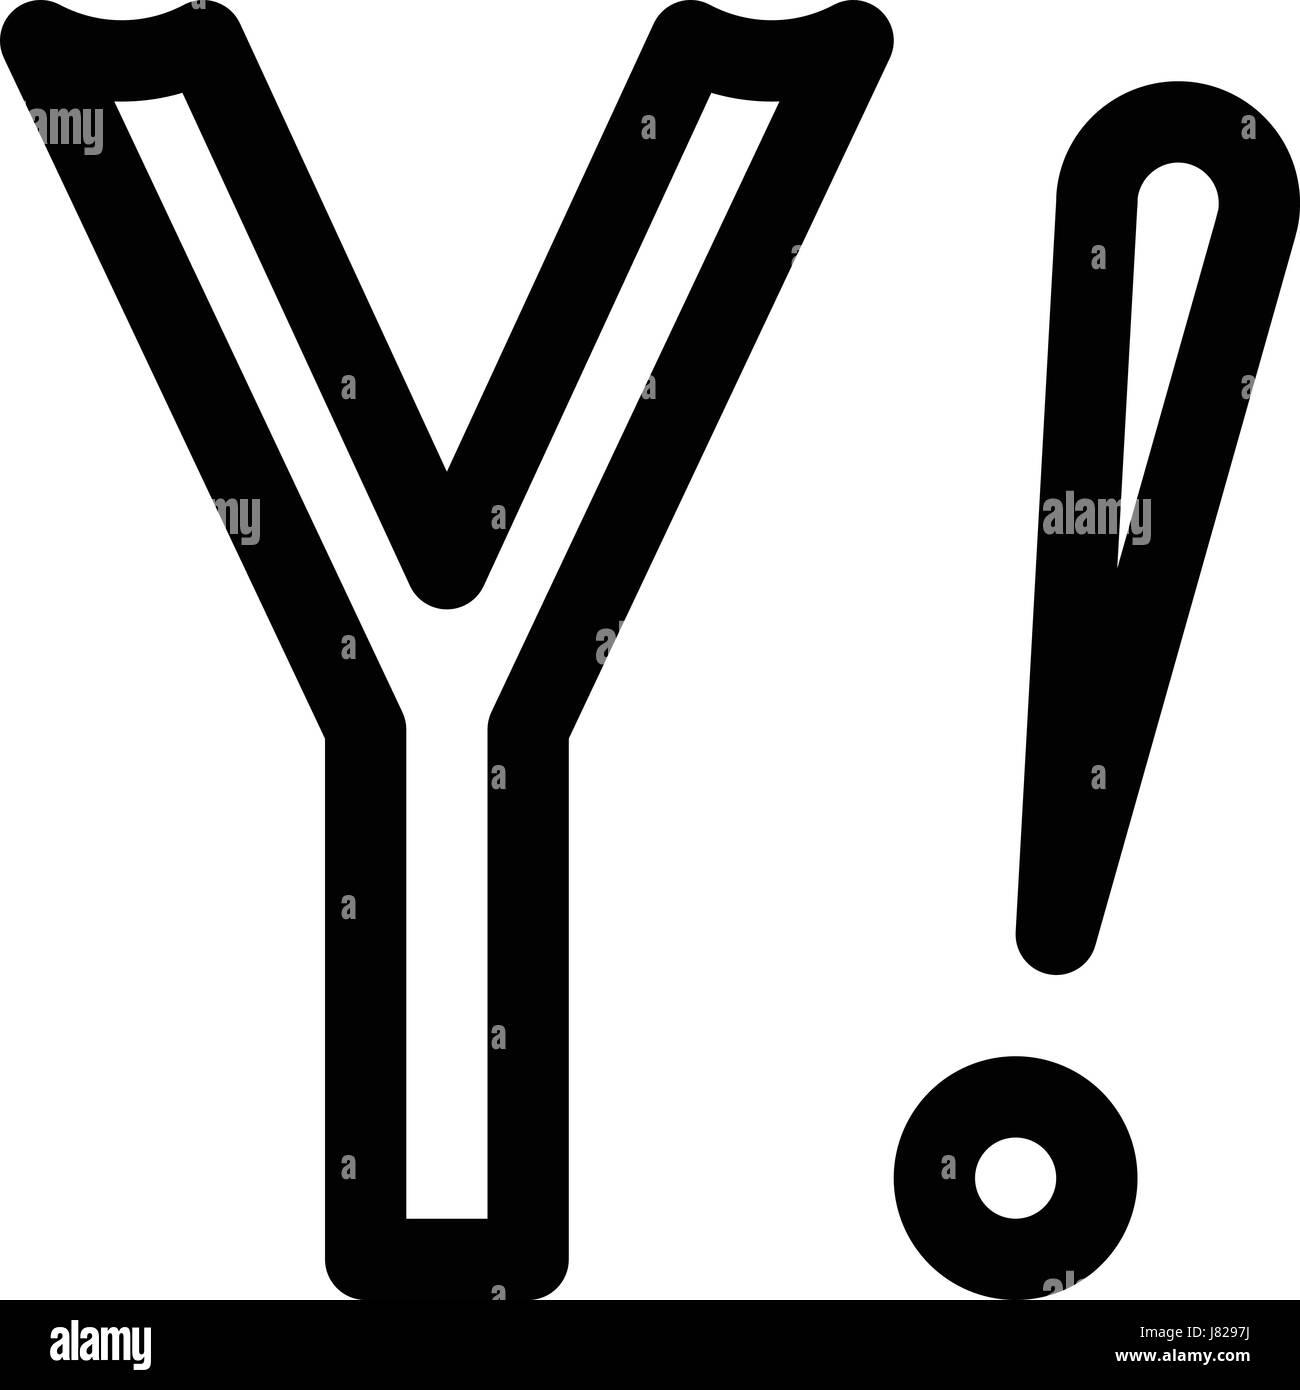 Yahoo Stock Vector Art Illustration Vector Image 142651366 Alamy